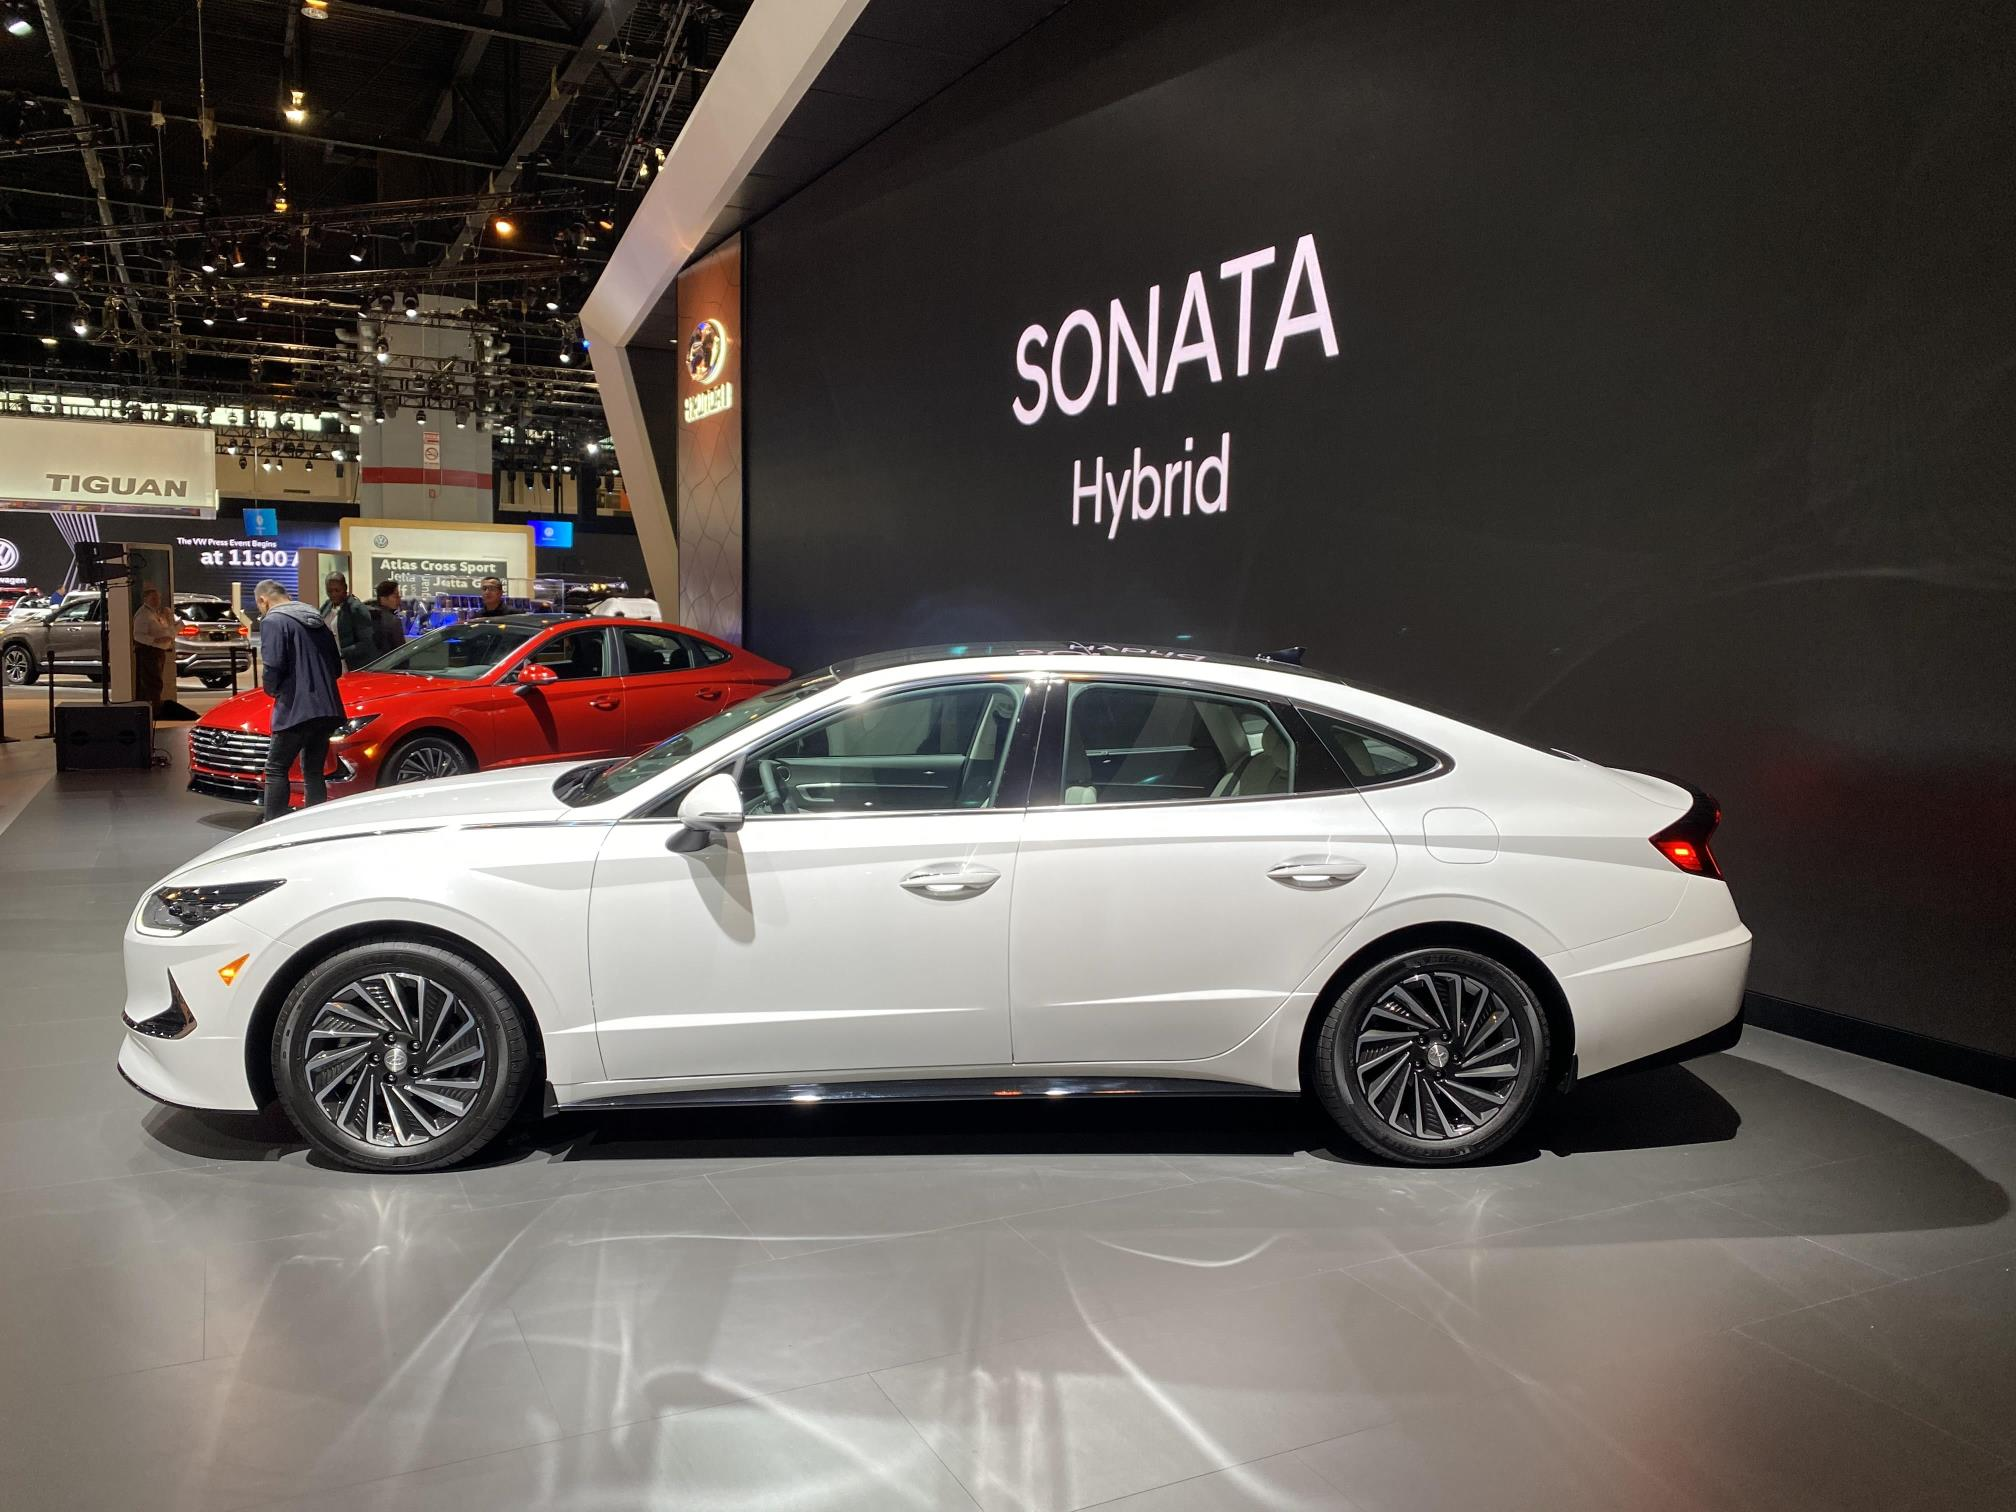 2020 Hyundai Sonata Hybrid Returns 52 MPG, Has Ugly Wheels ...